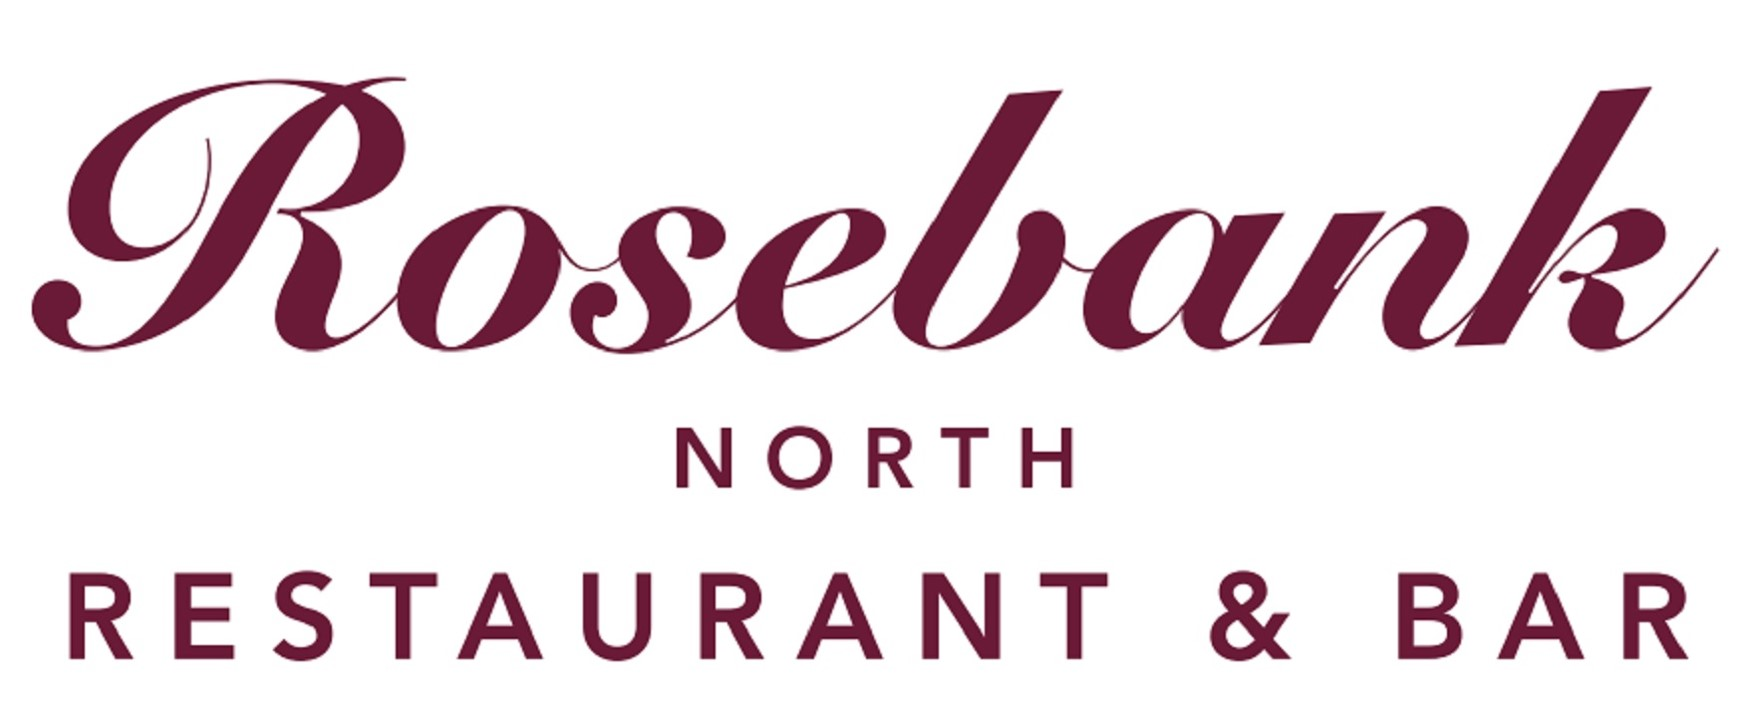 rosebank restaurant and bar